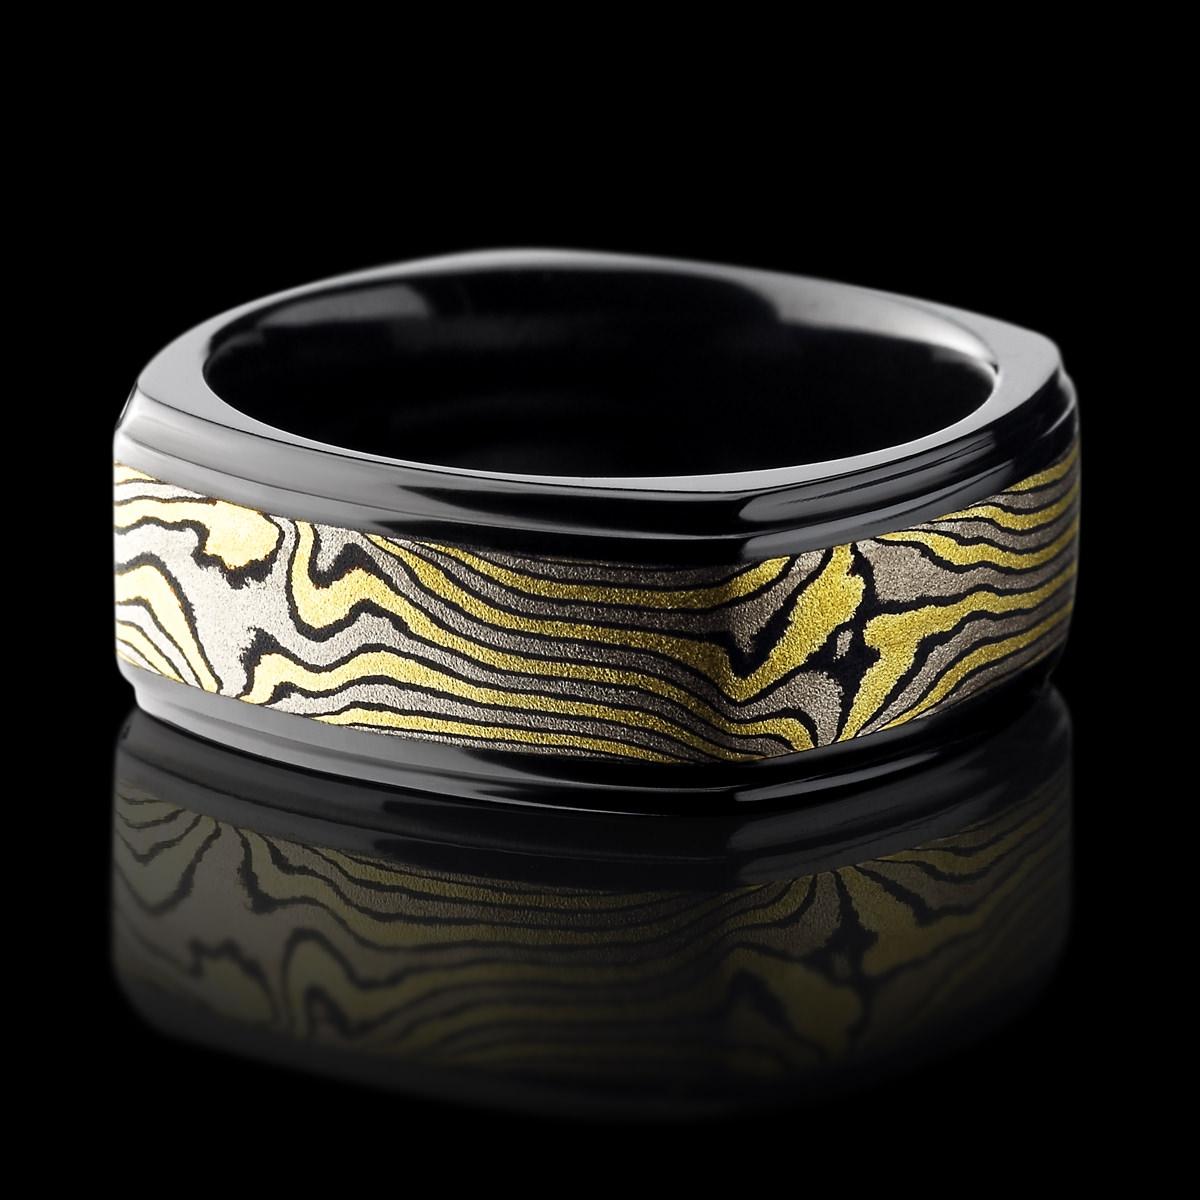 Black Zirconium Ring With Mokume Gane – Lashbrook Designs In Mokume Wedding Bands (View 12 of 15)